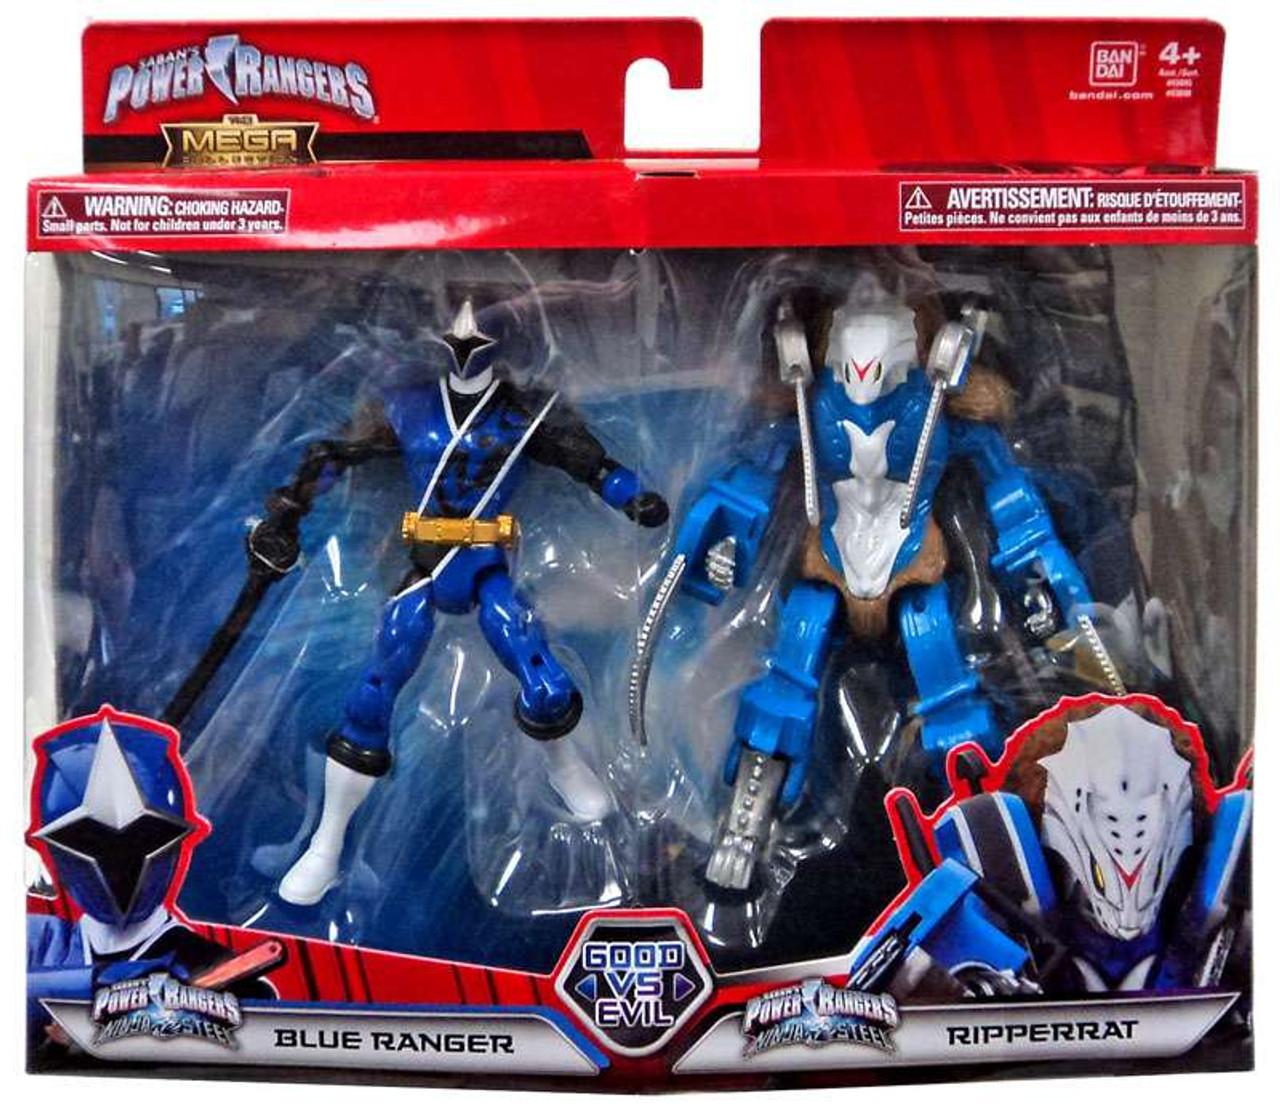 Power Rangers Mega Collection Good vs Evil Blue Ranger /& Ripperrat Action Figure Set Bandai America